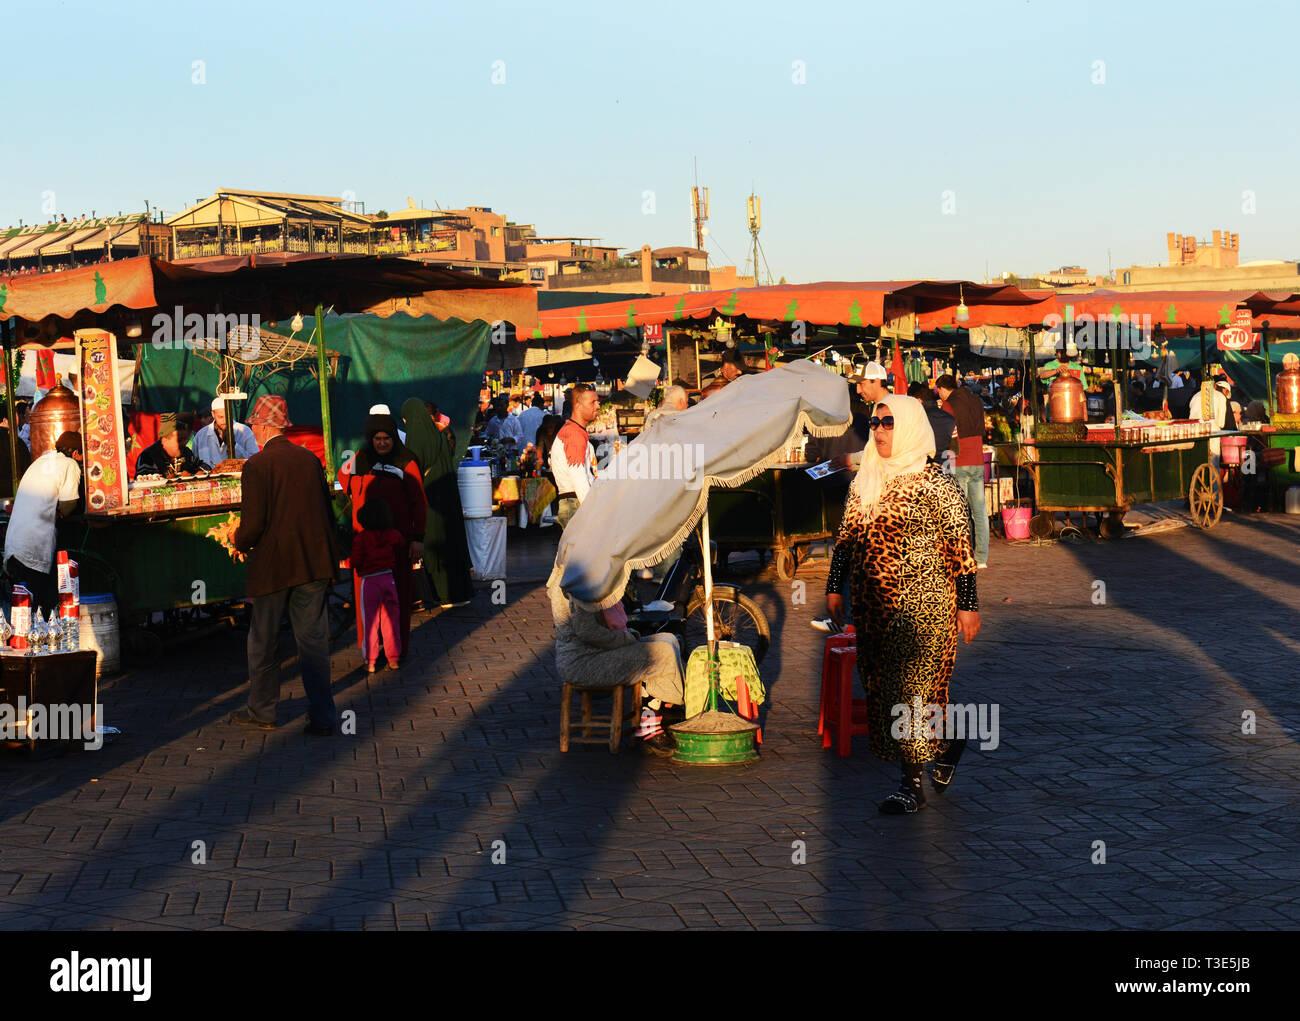 The colorful Djema el-Fna sq. in Marrakesh. - Stock Photo